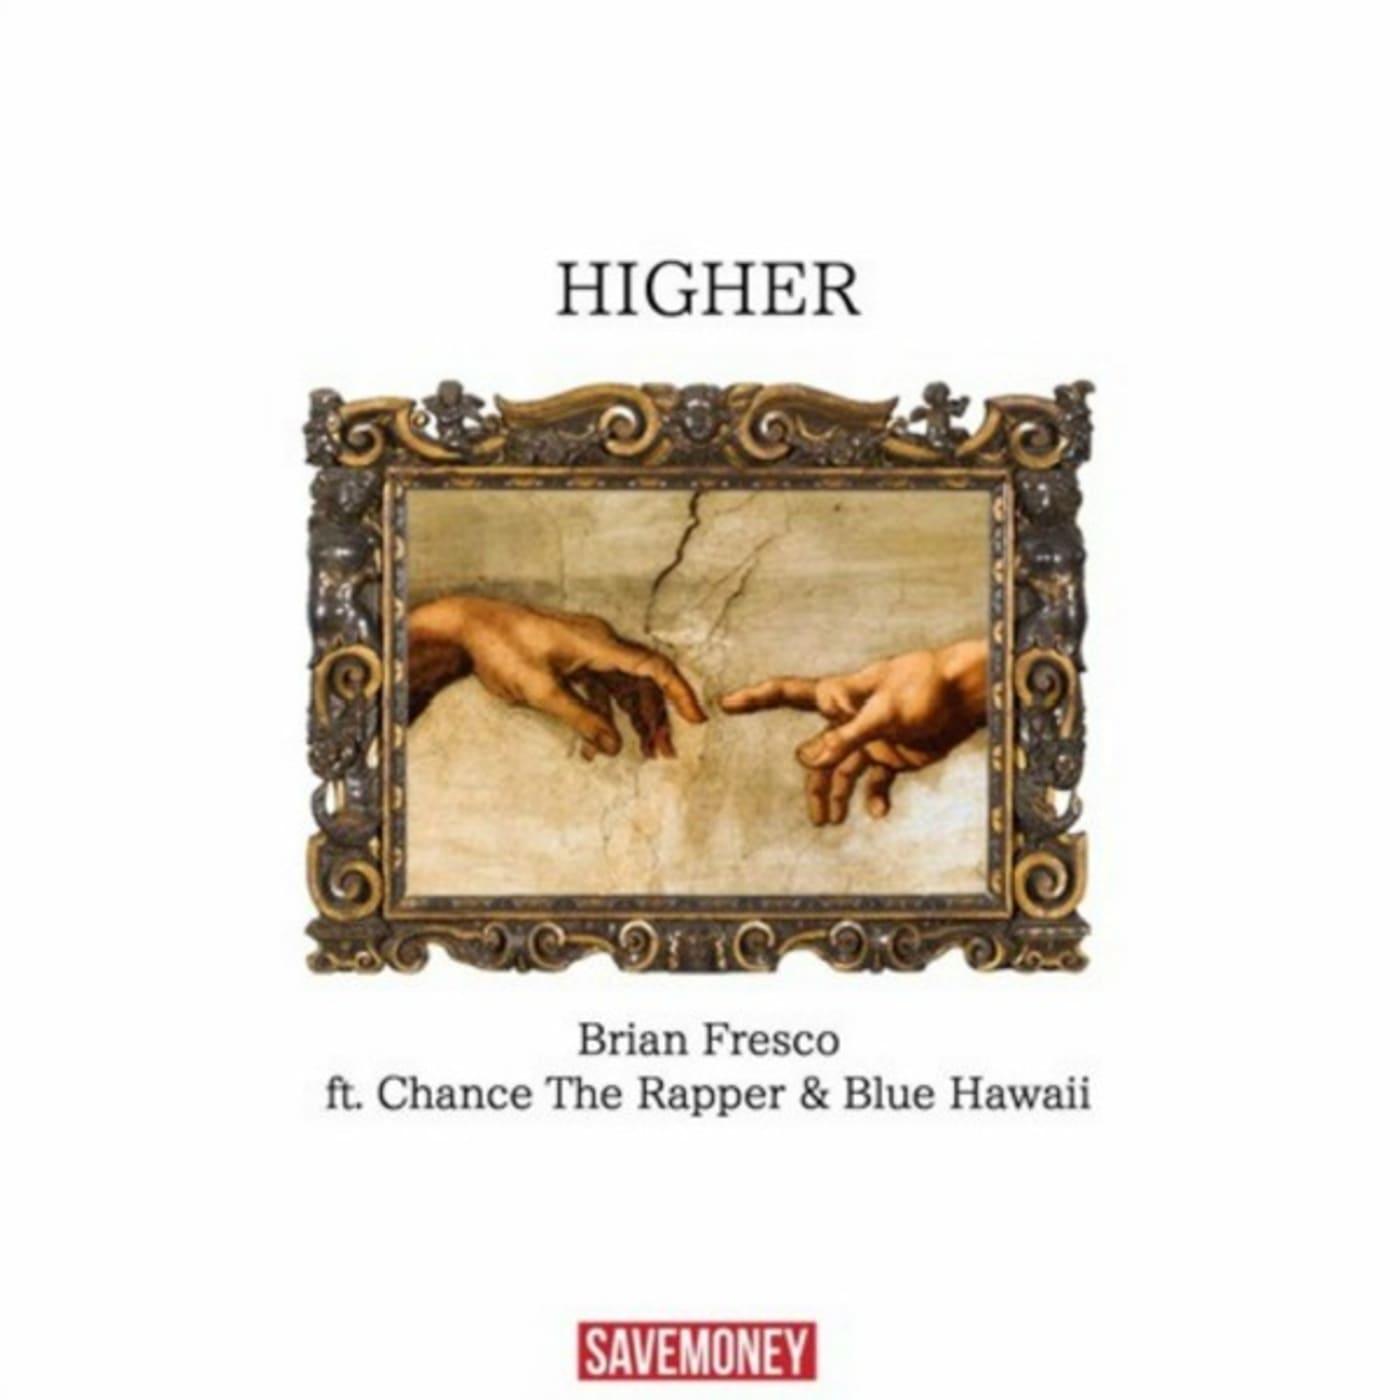 brian fresco higher feat chance the rapper